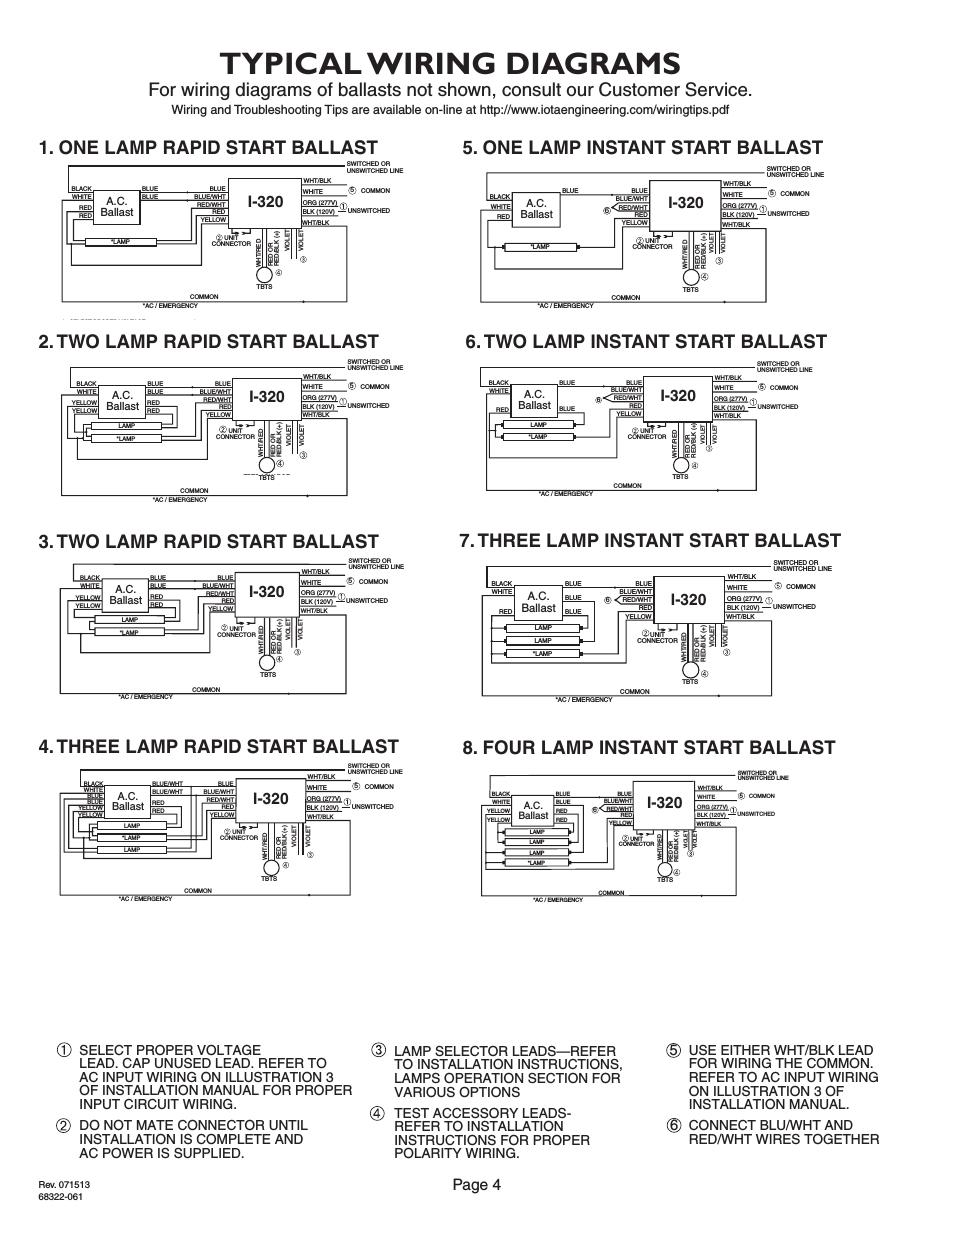 iota i 24 emergency ballast wiring diagram free wiring. Black Bedroom Furniture Sets. Home Design Ideas